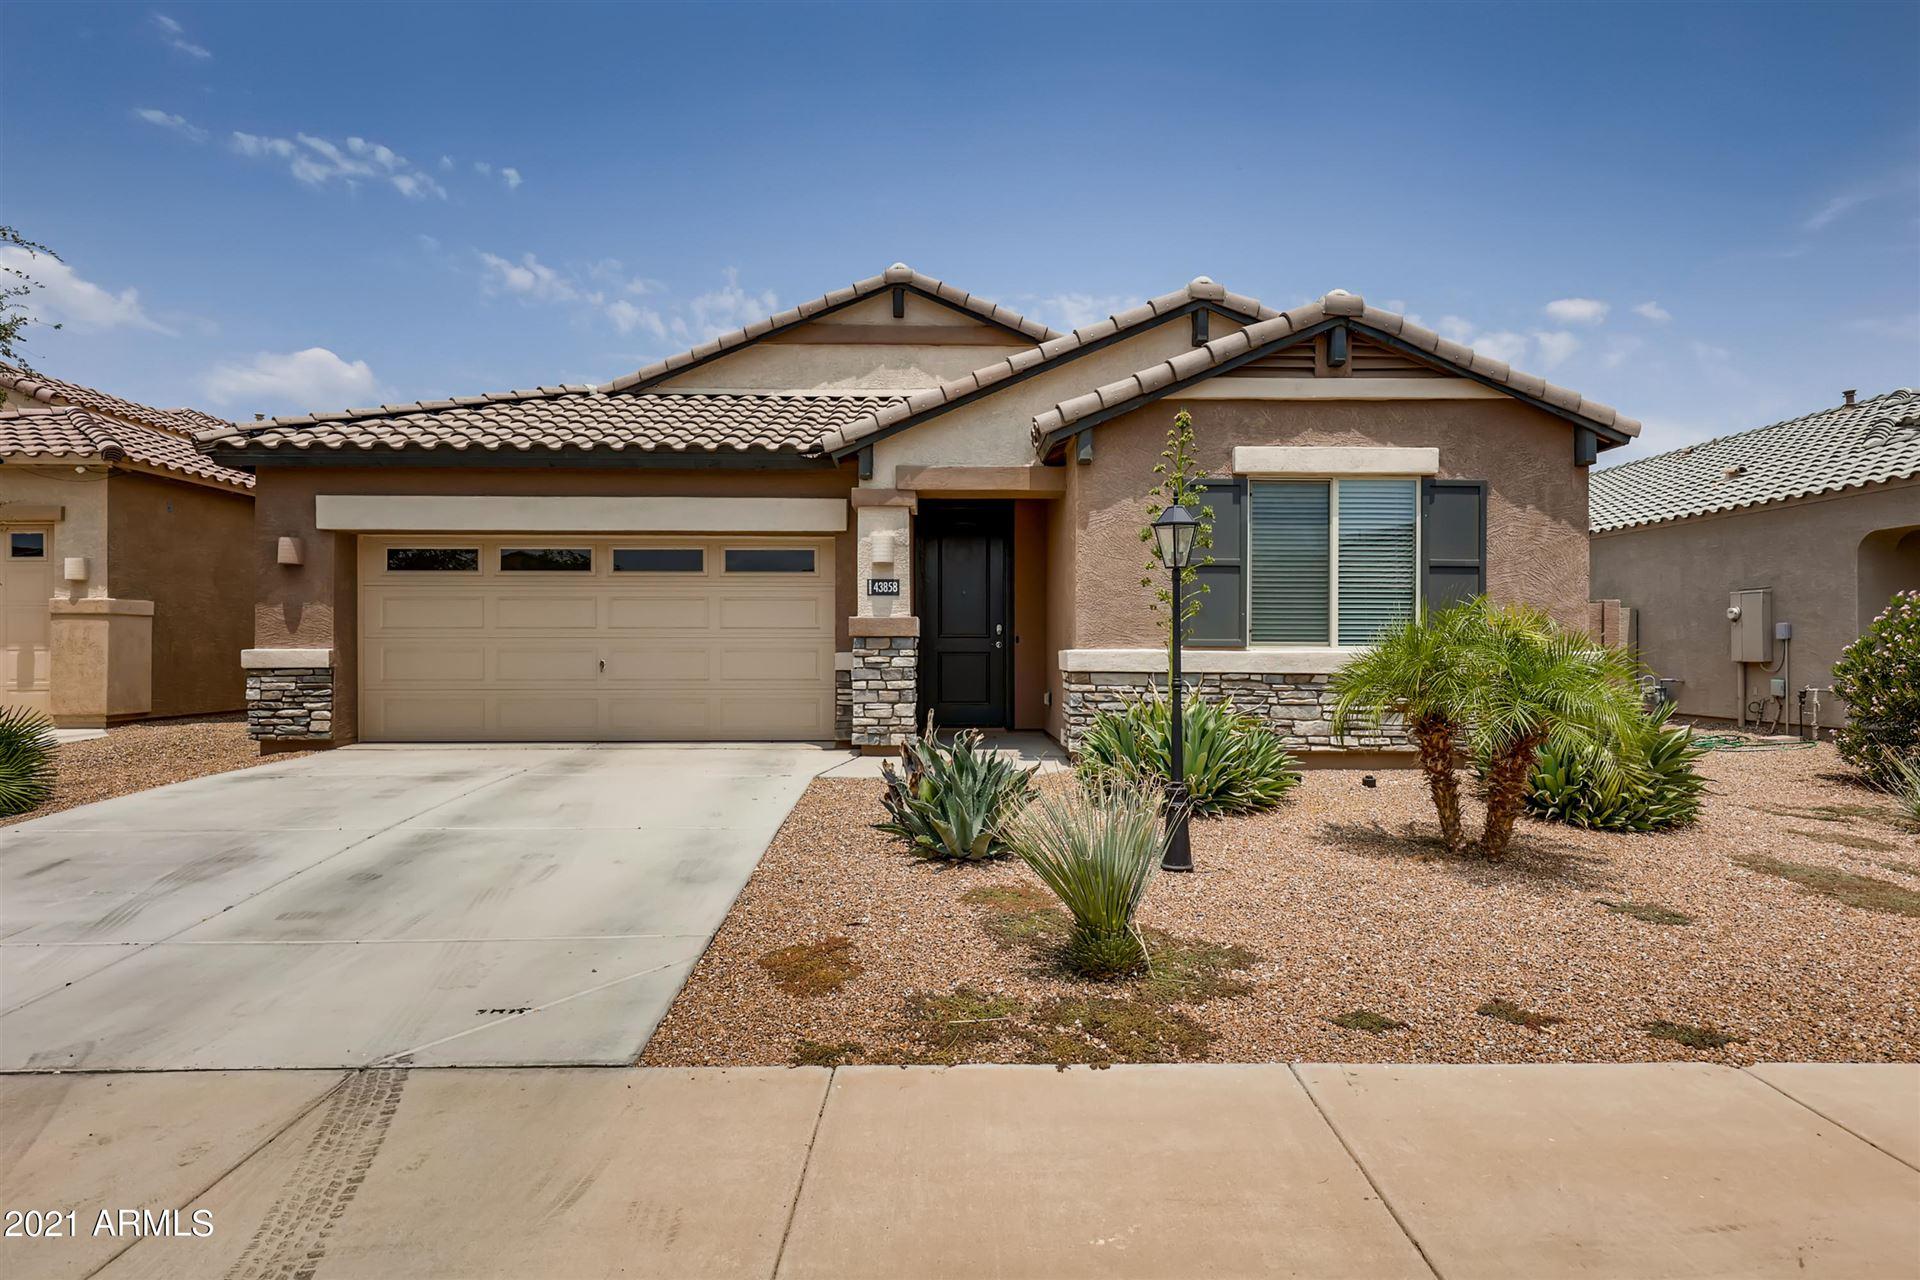 Photo for 43858 W BAILEY Drive, Maricopa, AZ 85138 (MLS # 6267955)